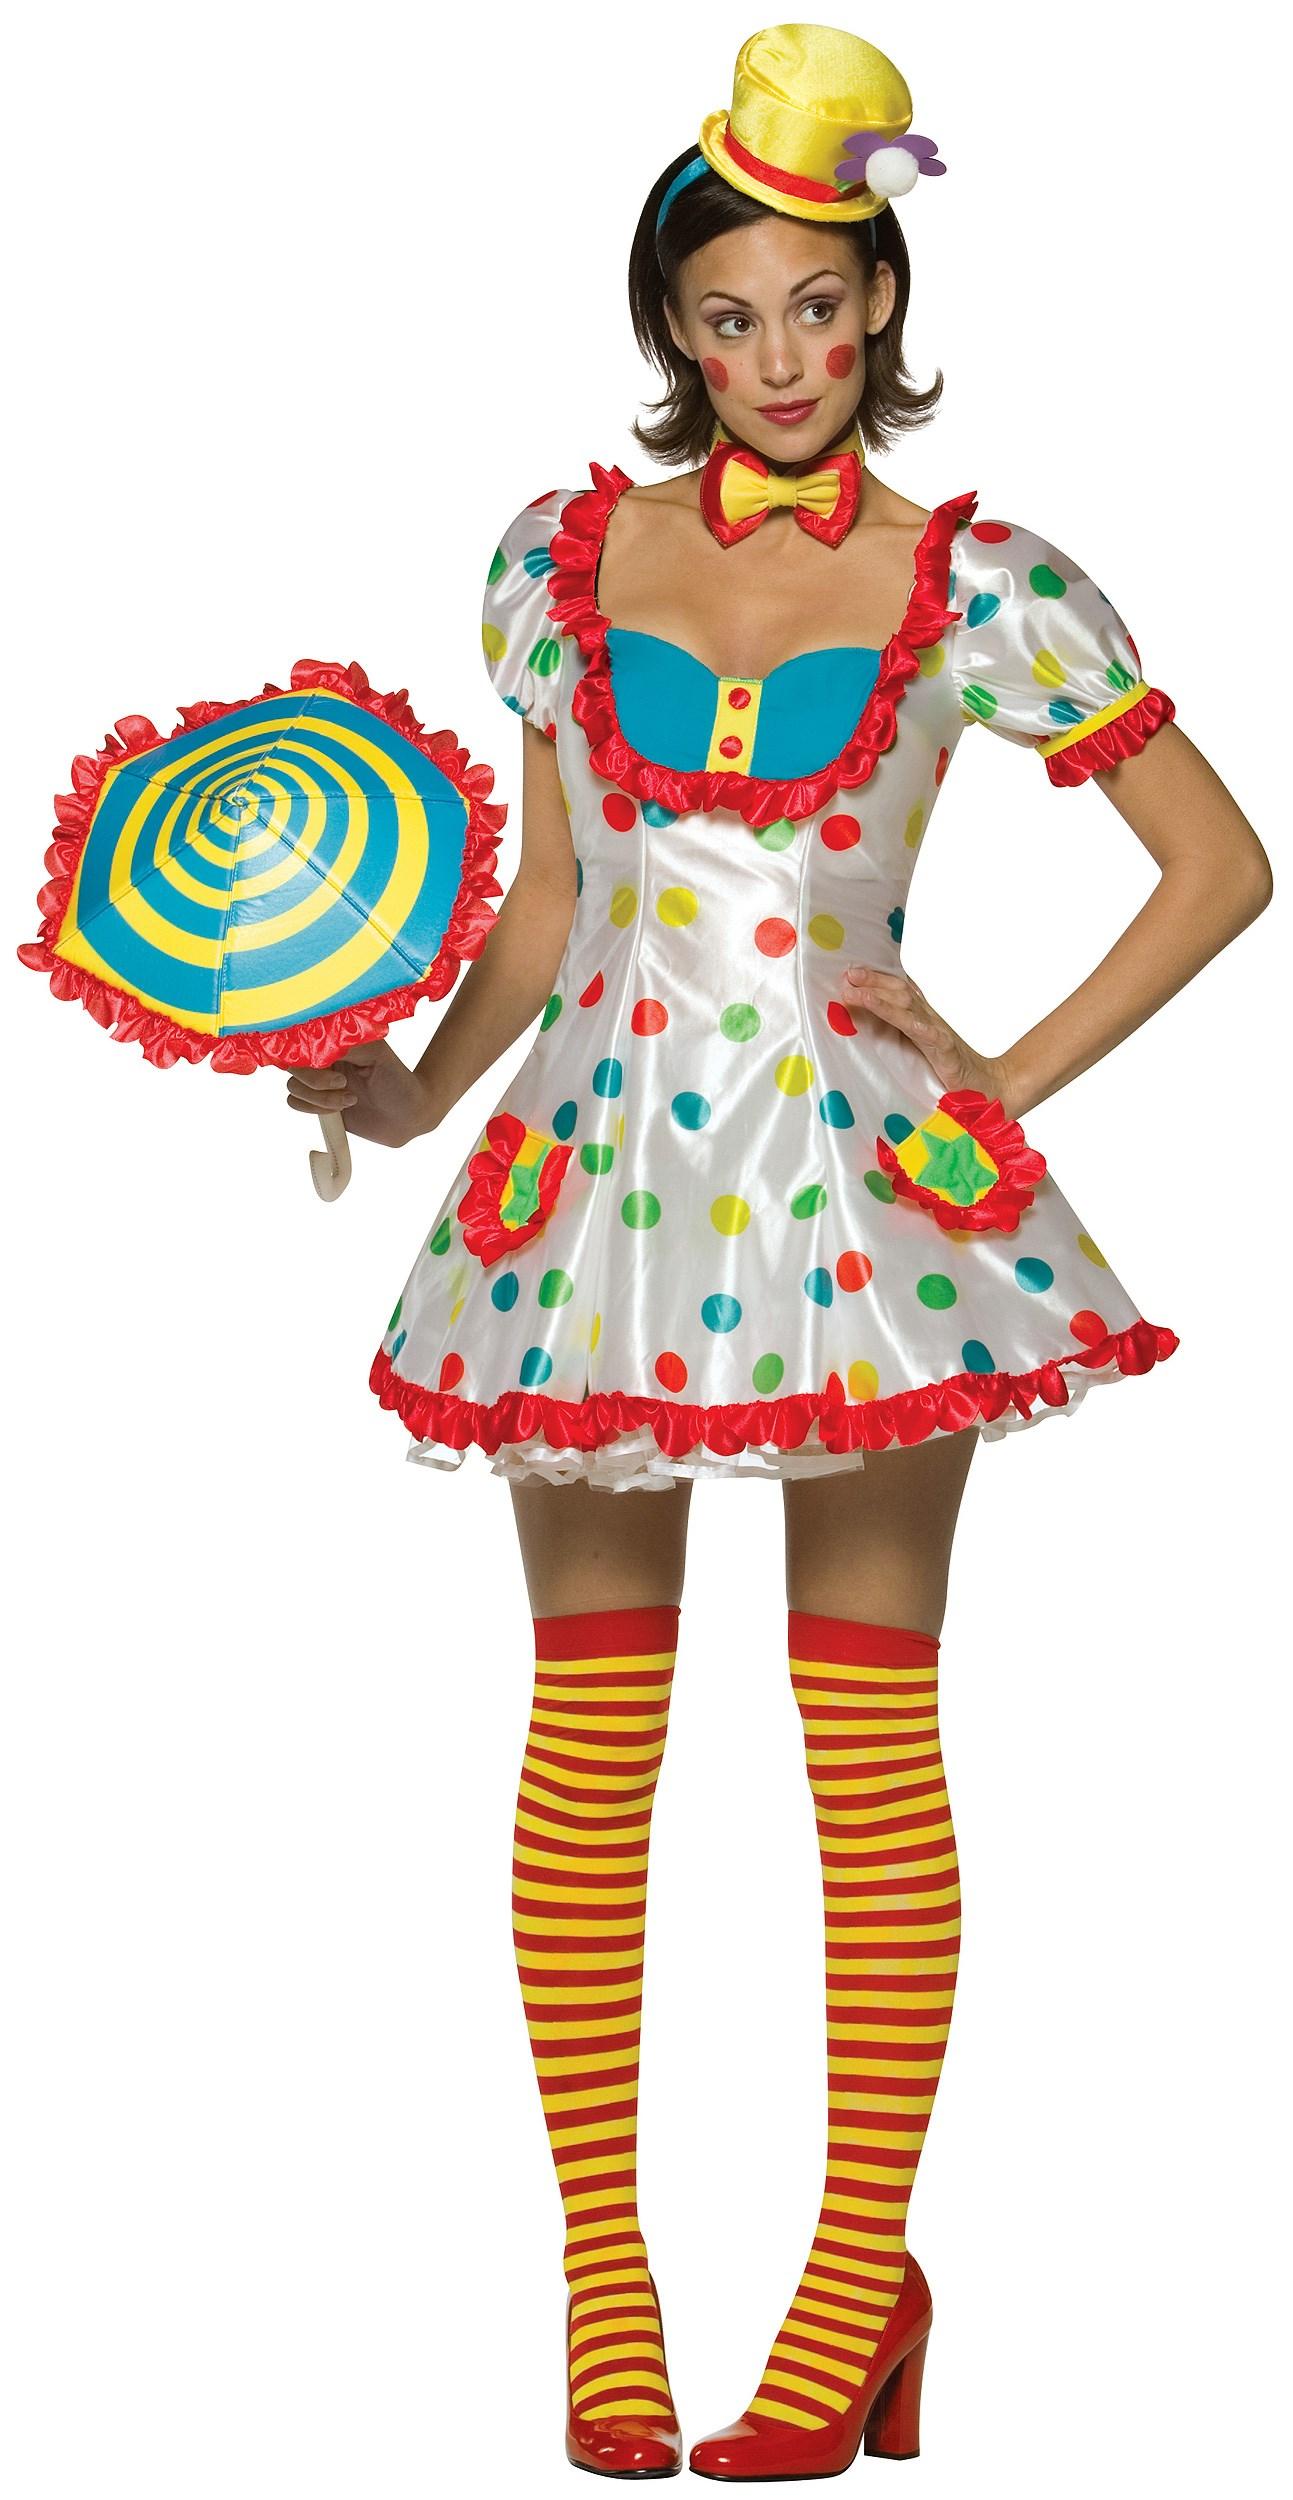 Clown Female Adult Costume